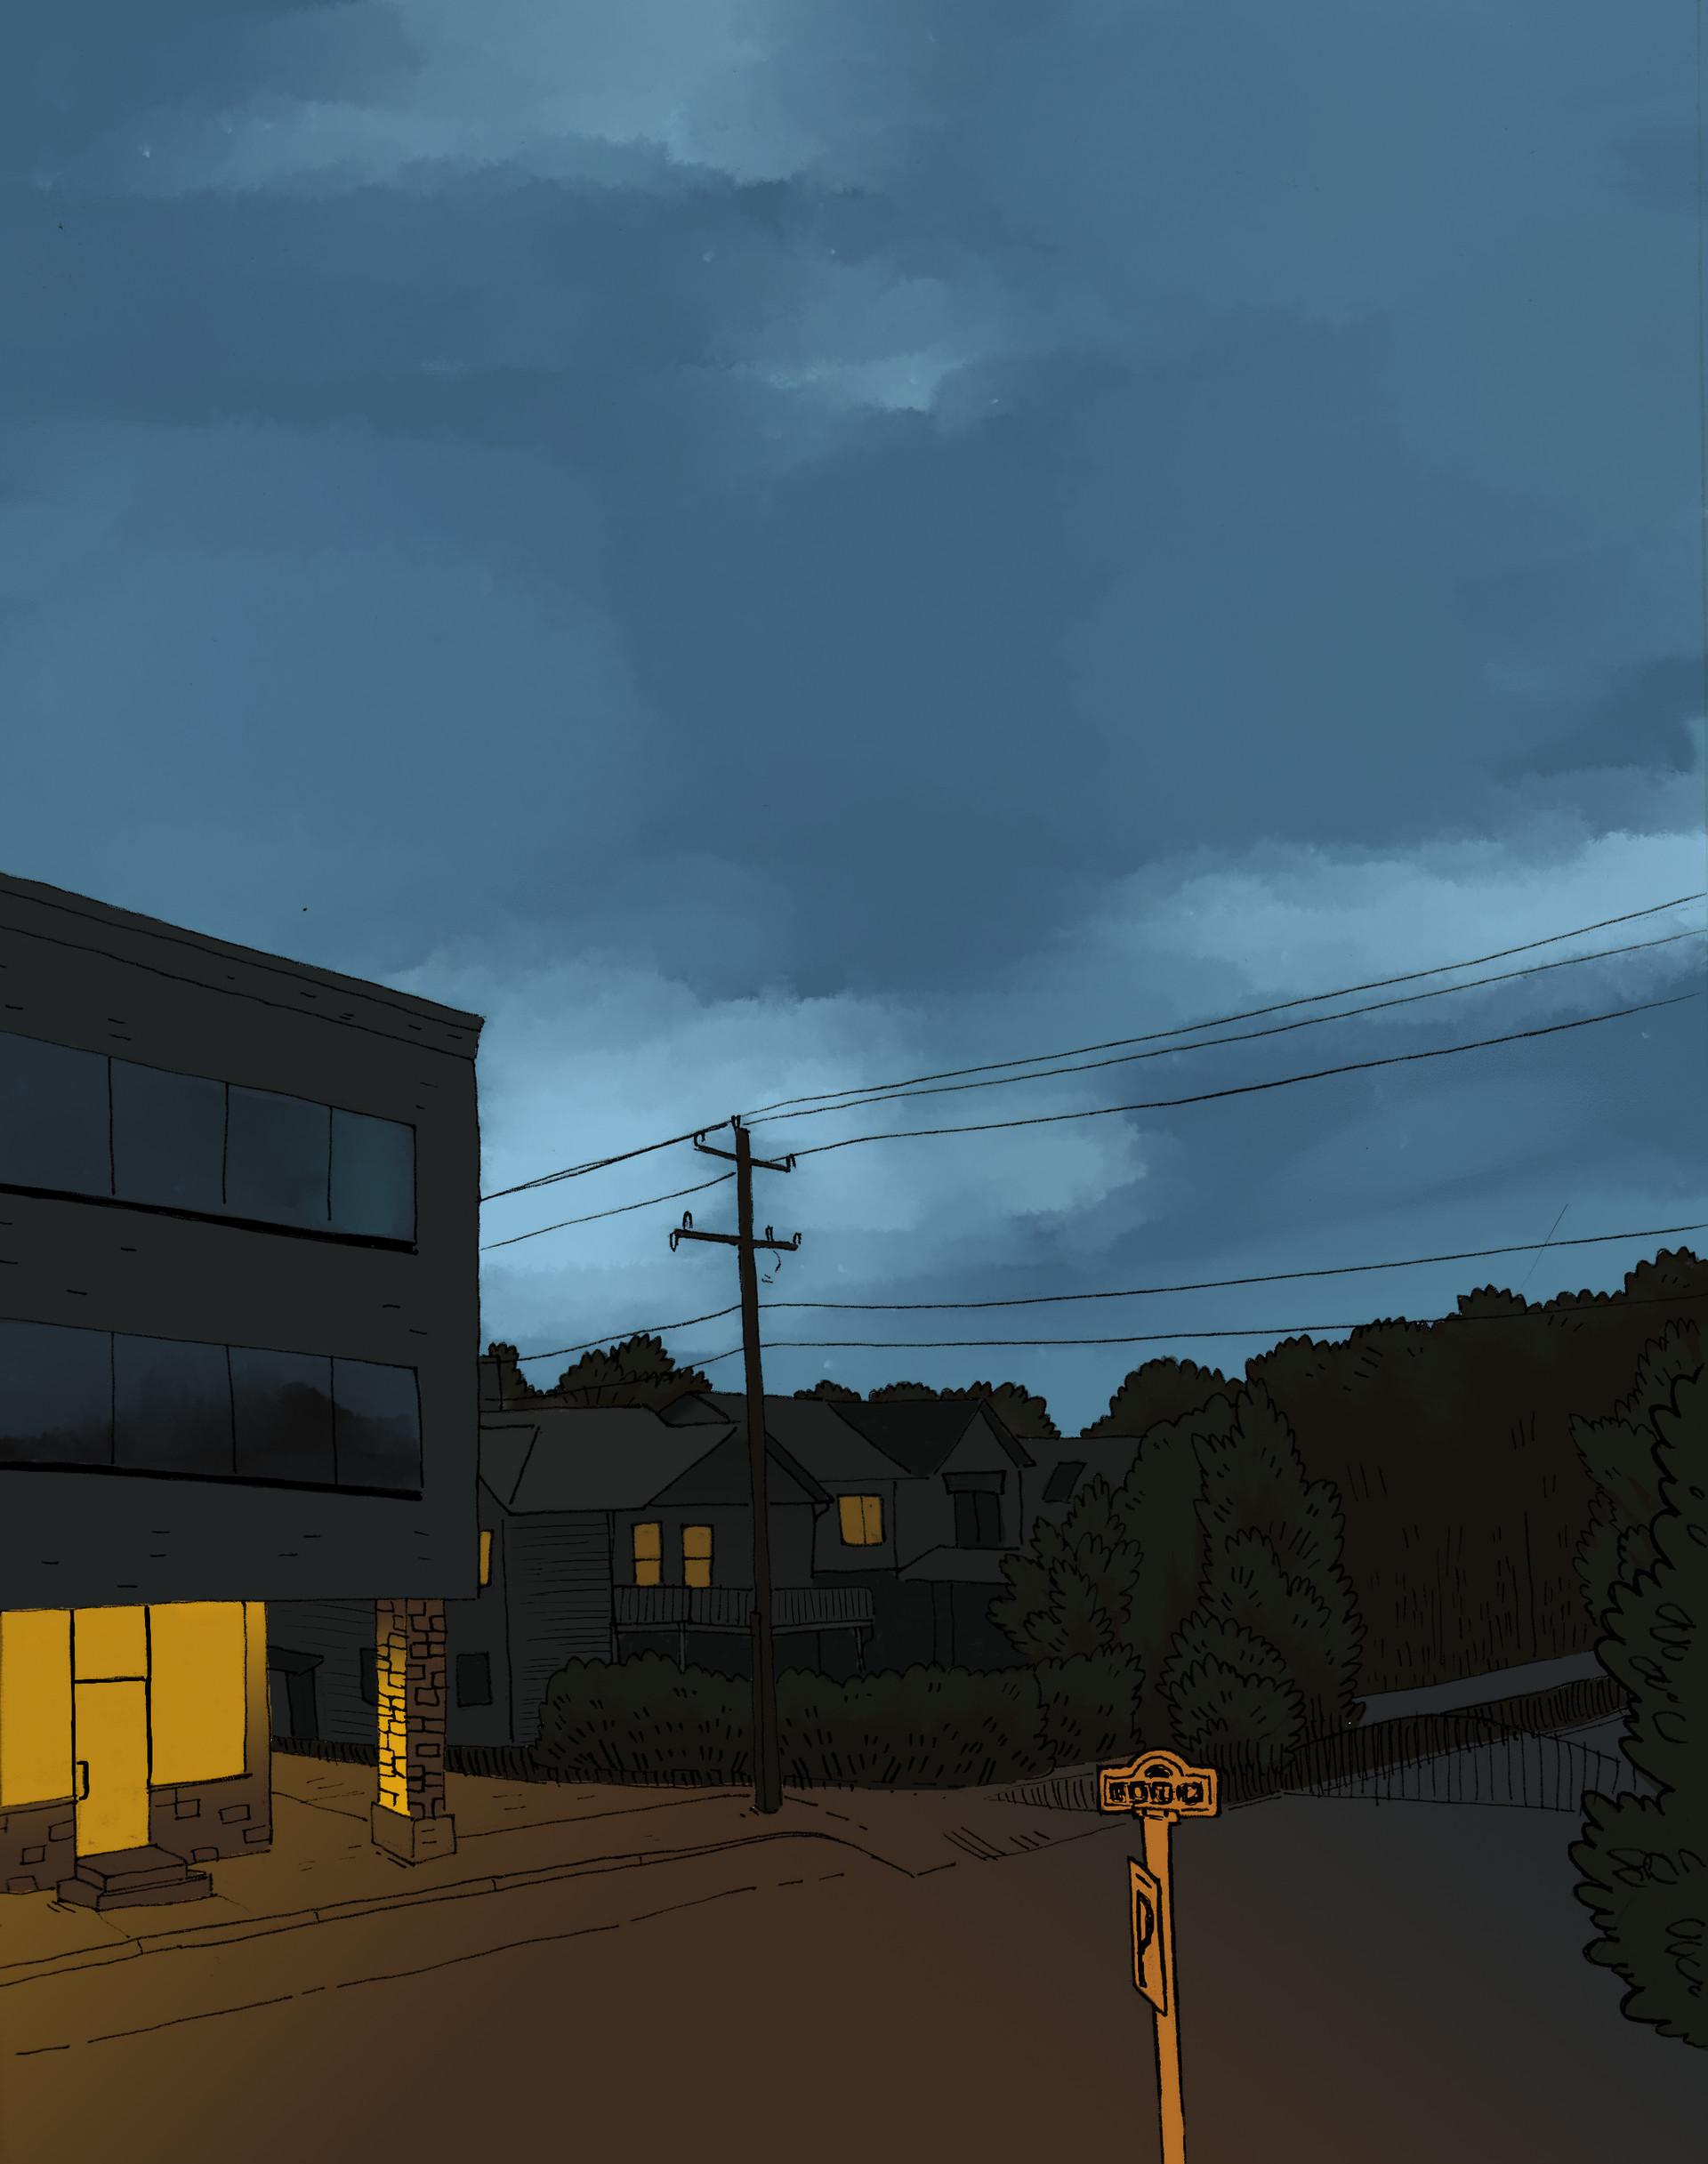 8:00 pm